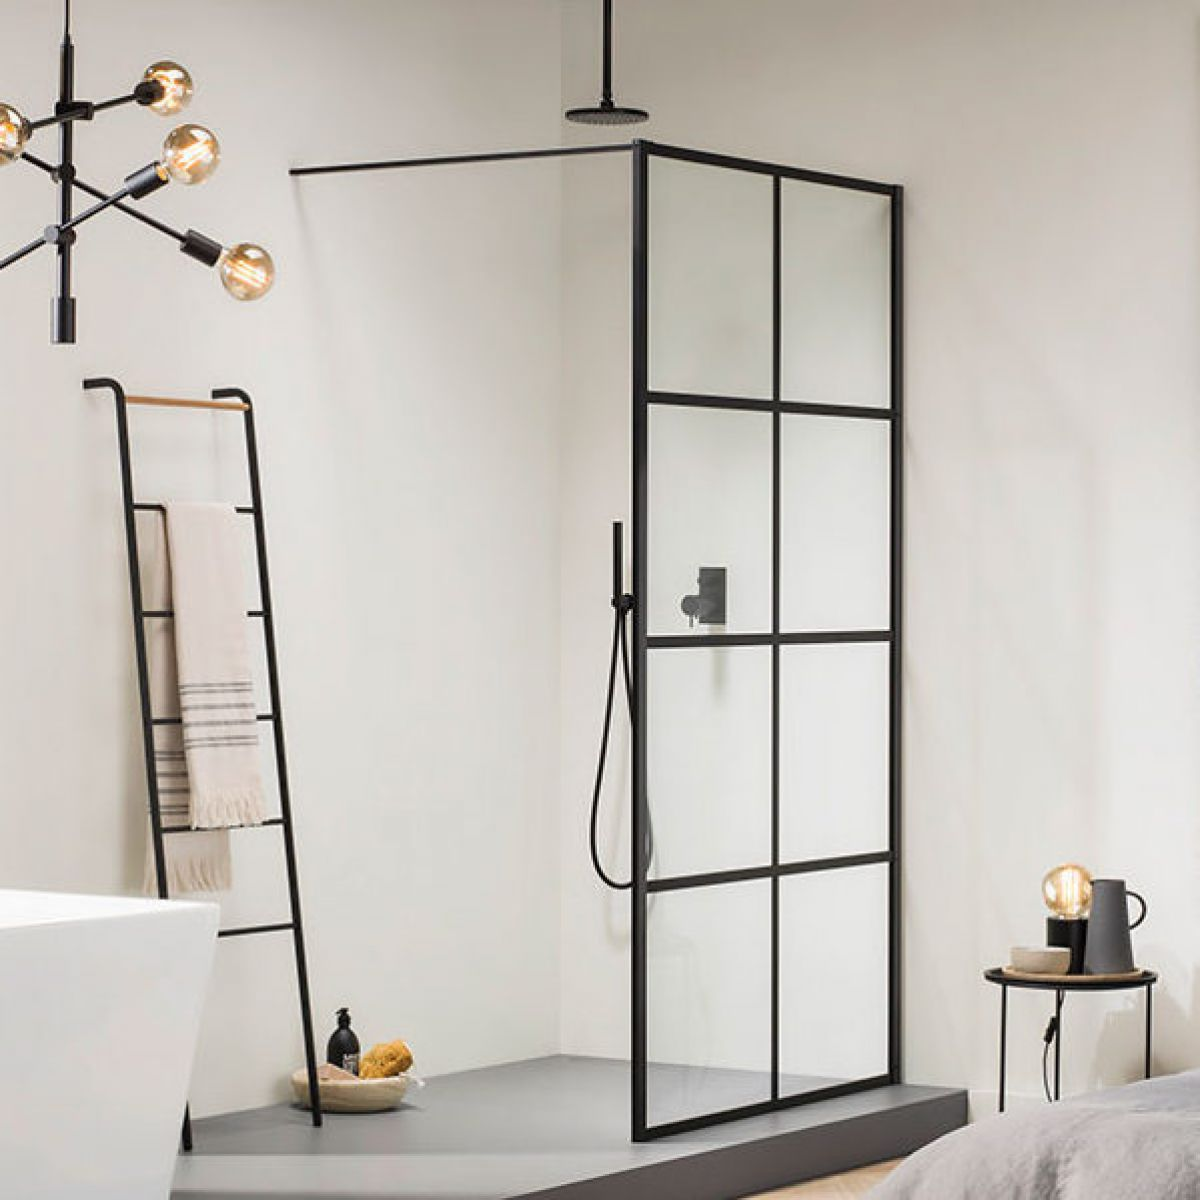 black screen idea for shower room